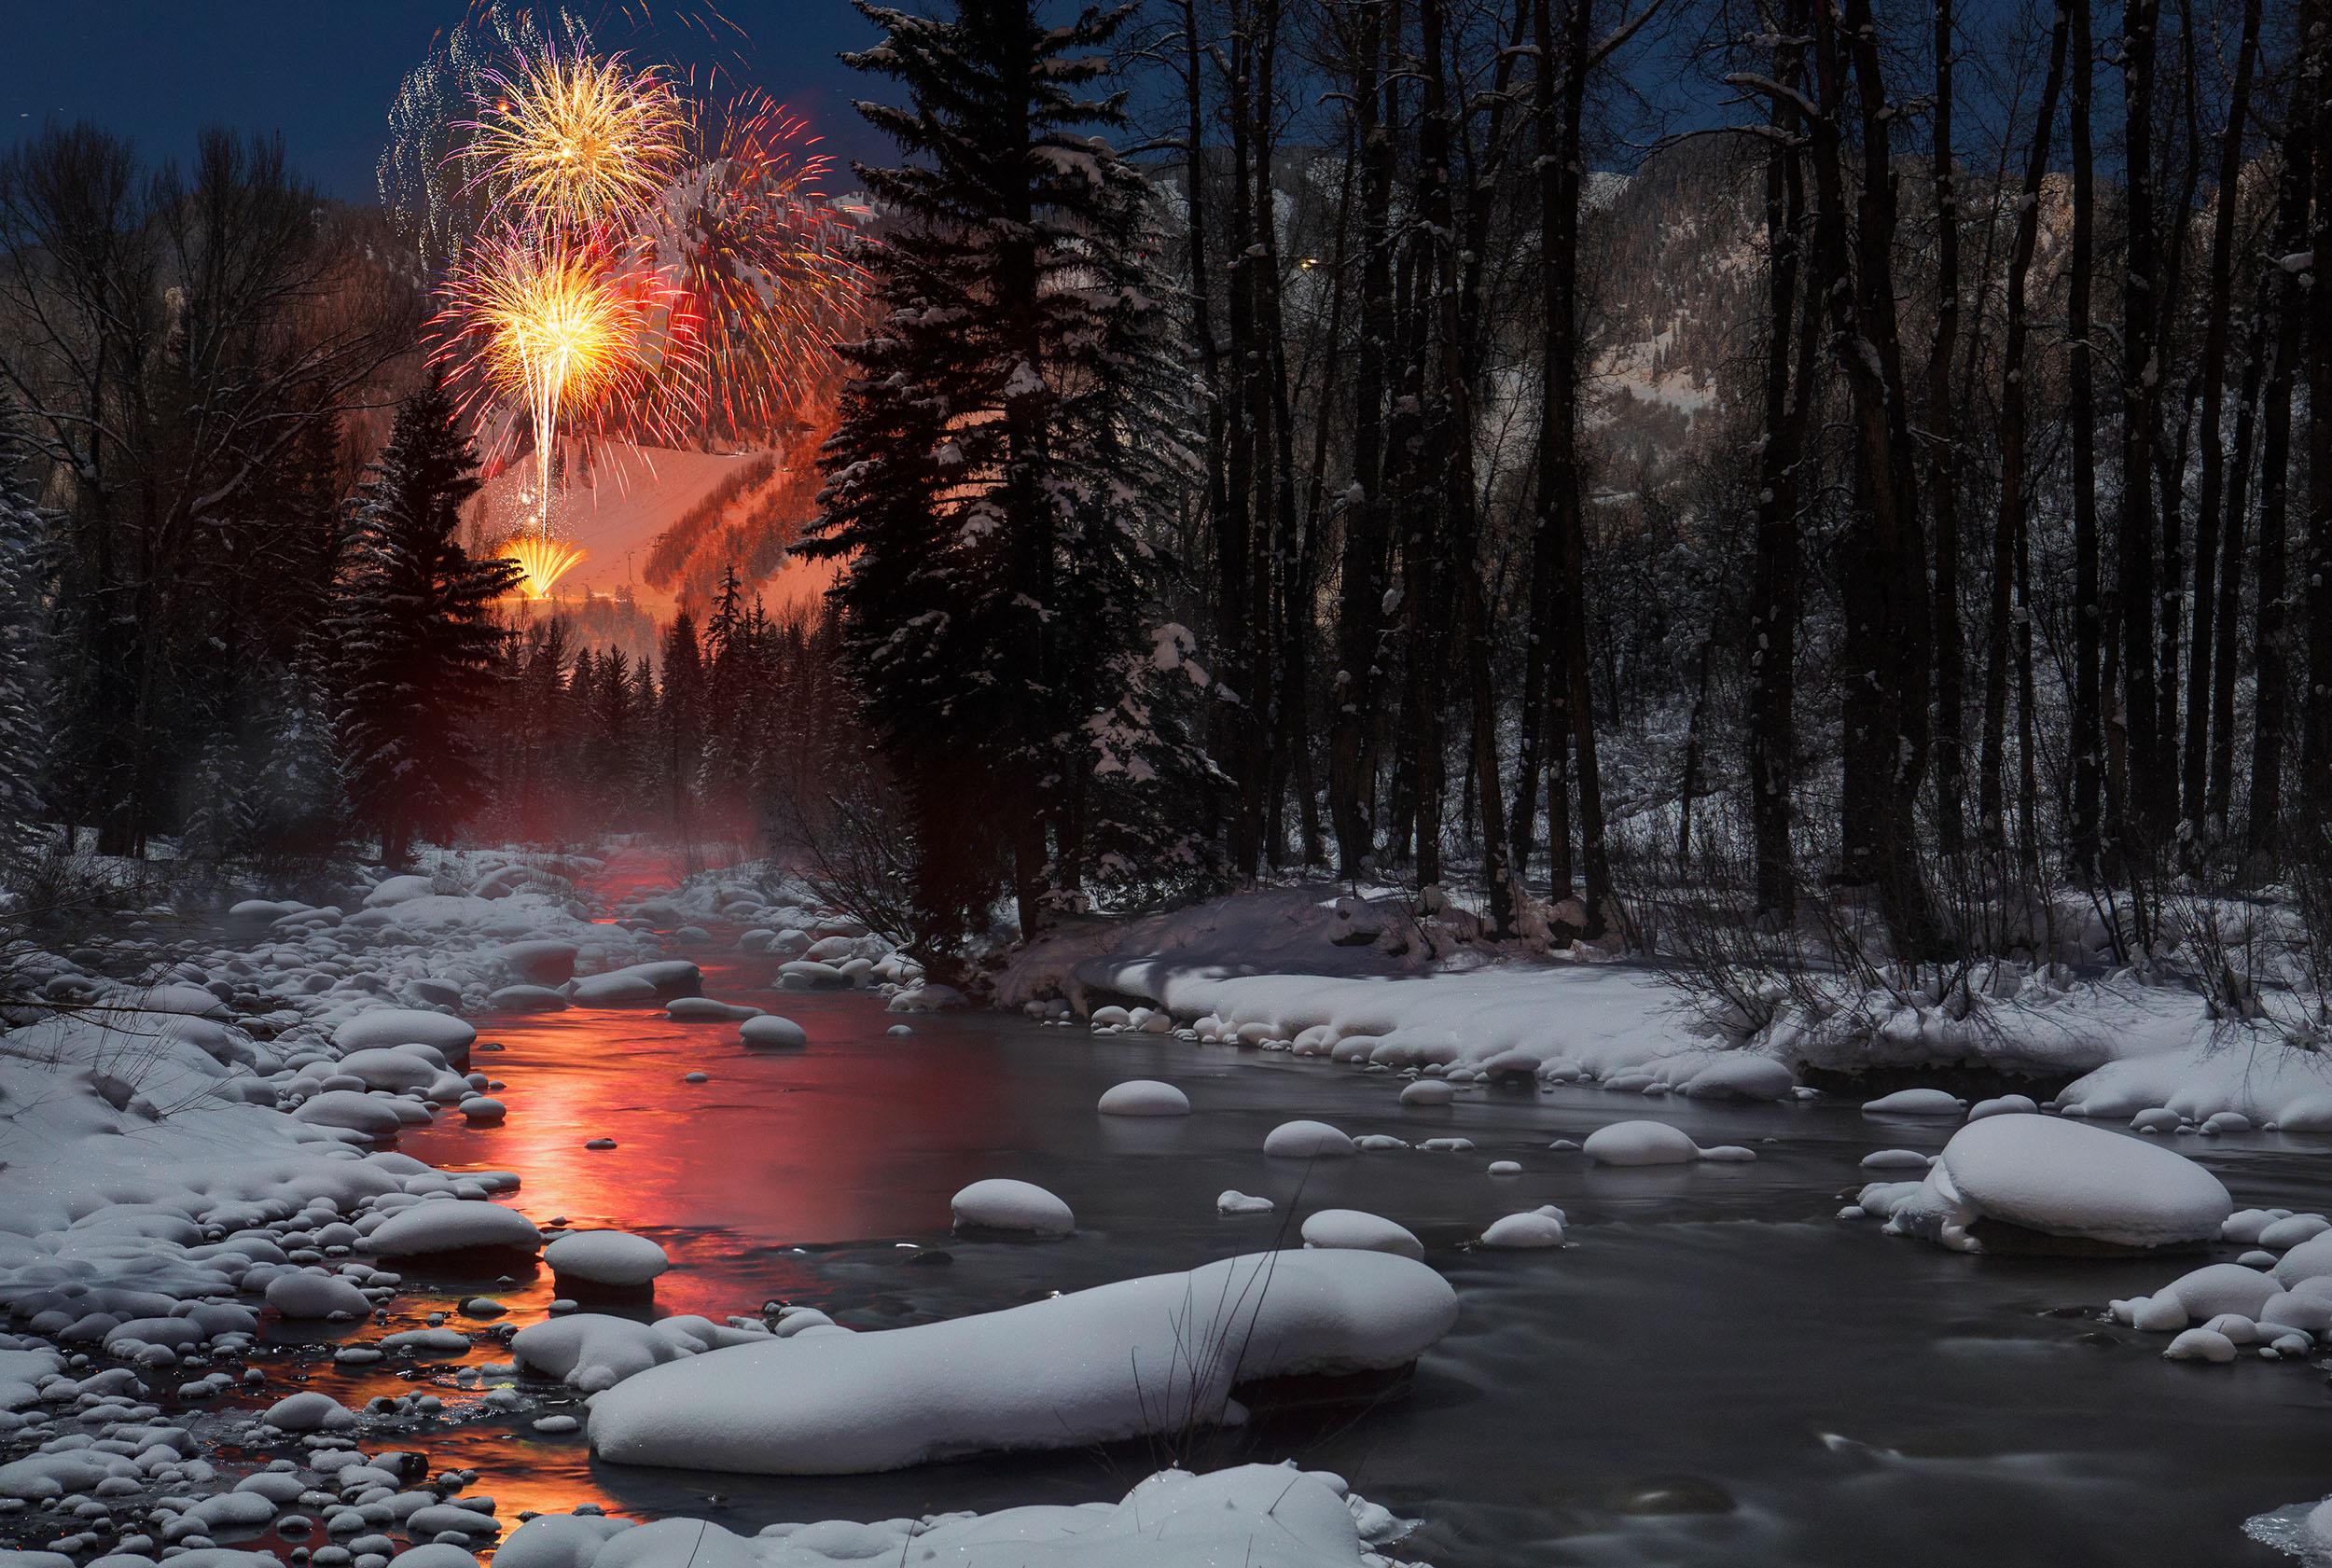 Fireworks_SM.jpg